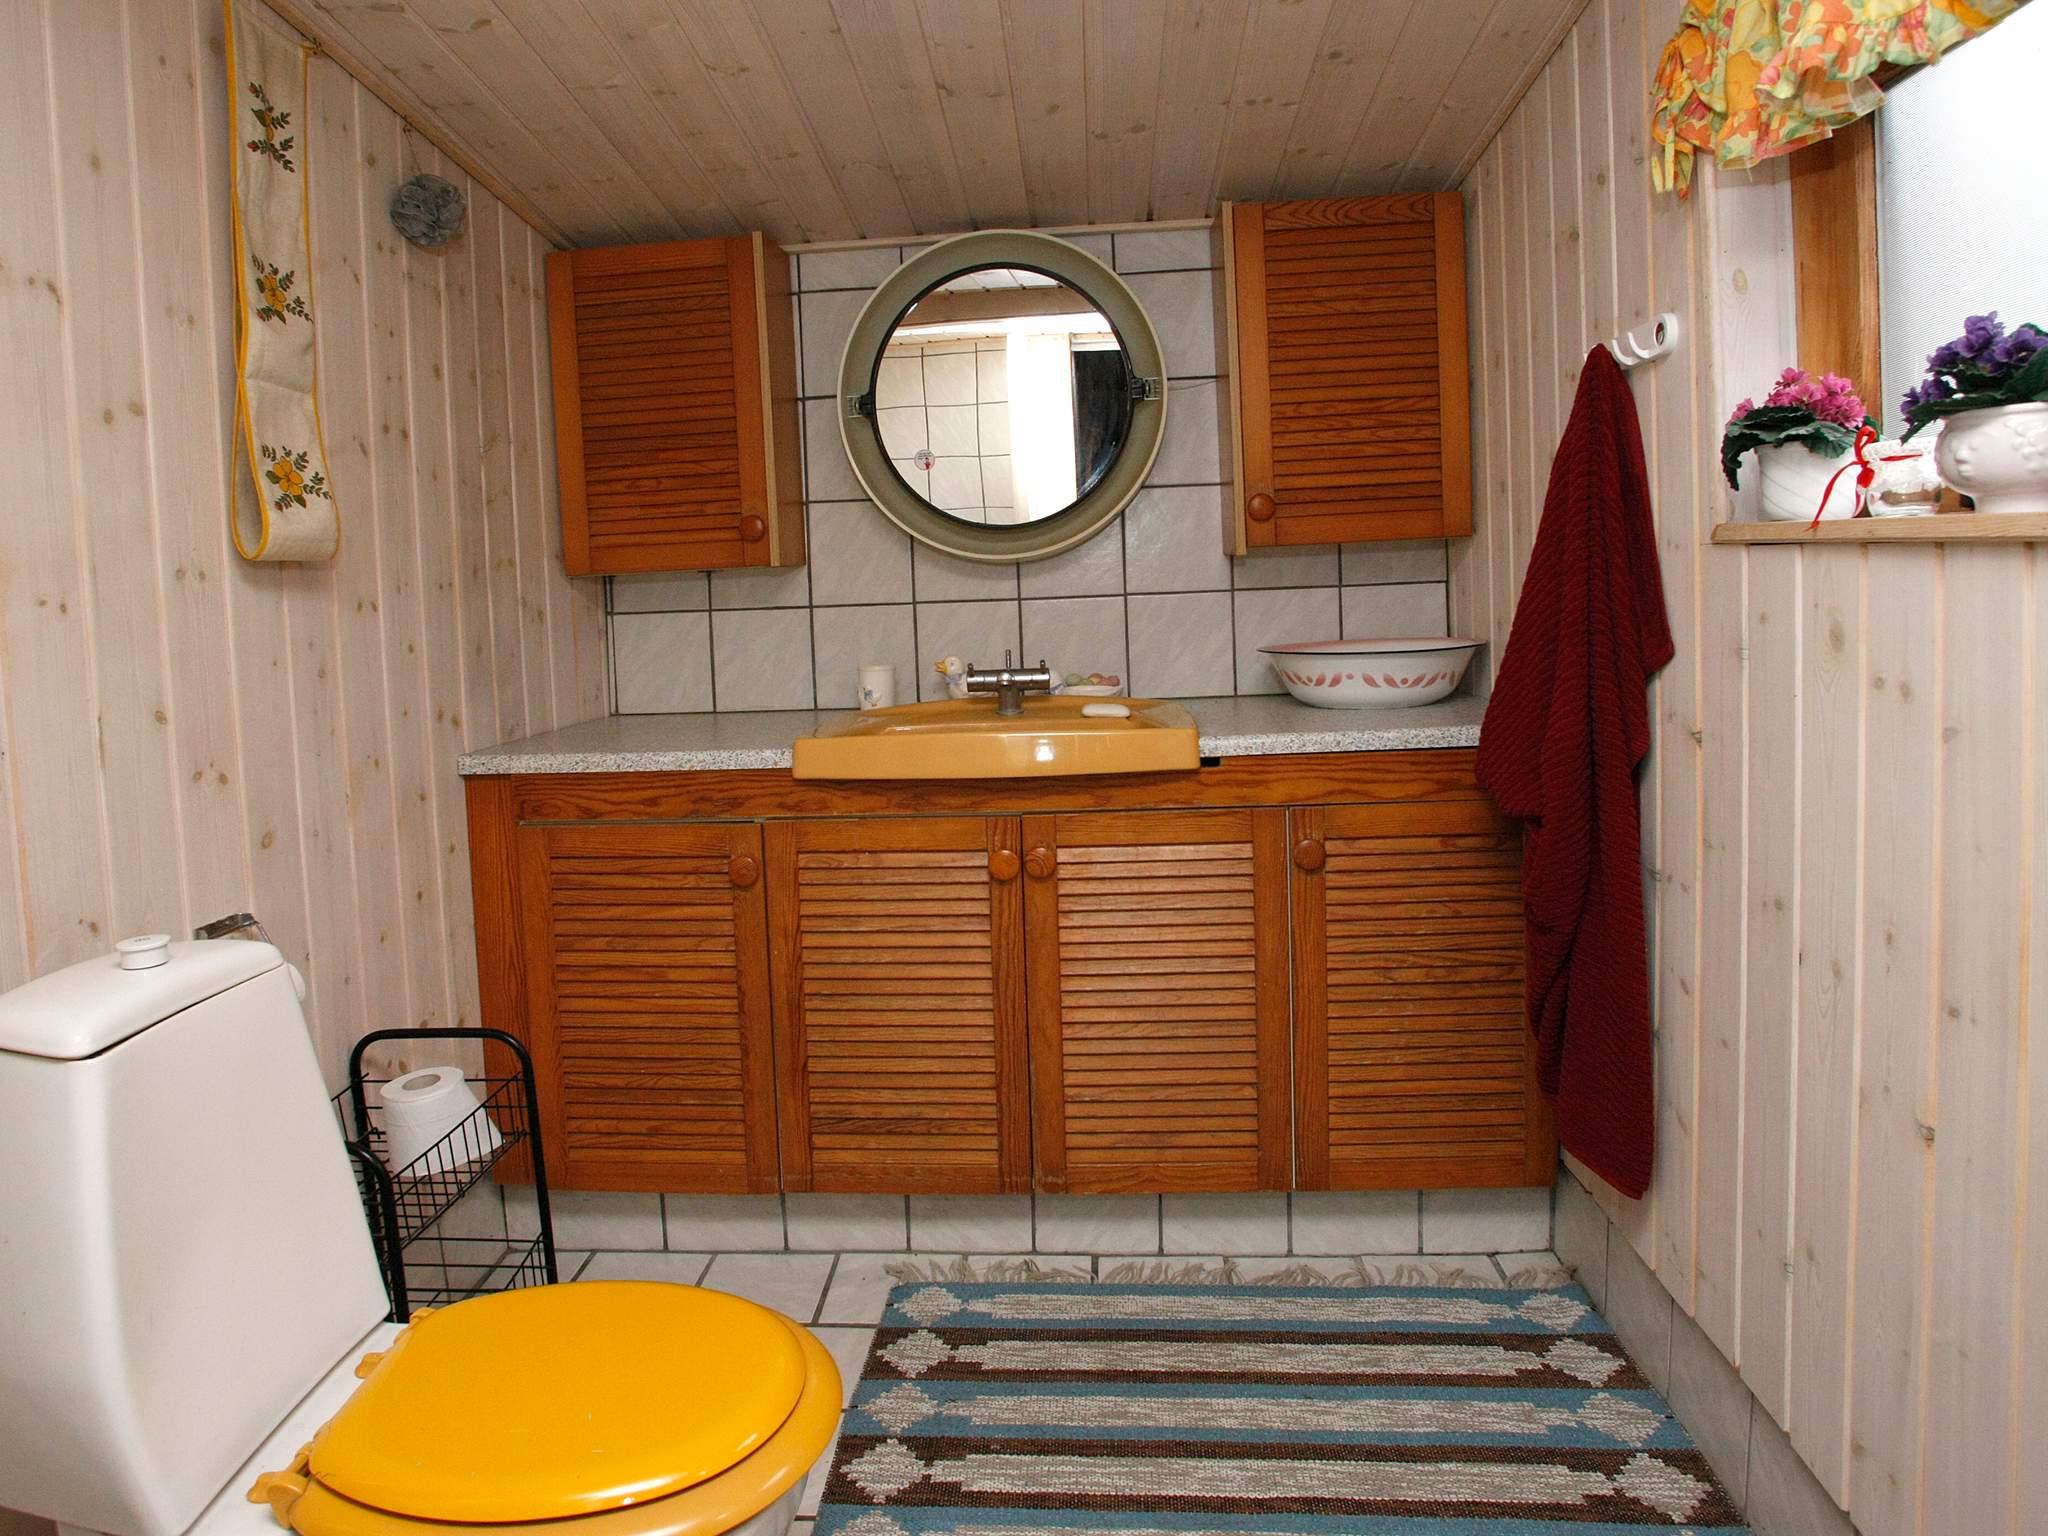 Ferienhaus Thyholm/Serup Strand (82880), Thyholm, Thyholm, Limfjord, Dänemark, Bild 12